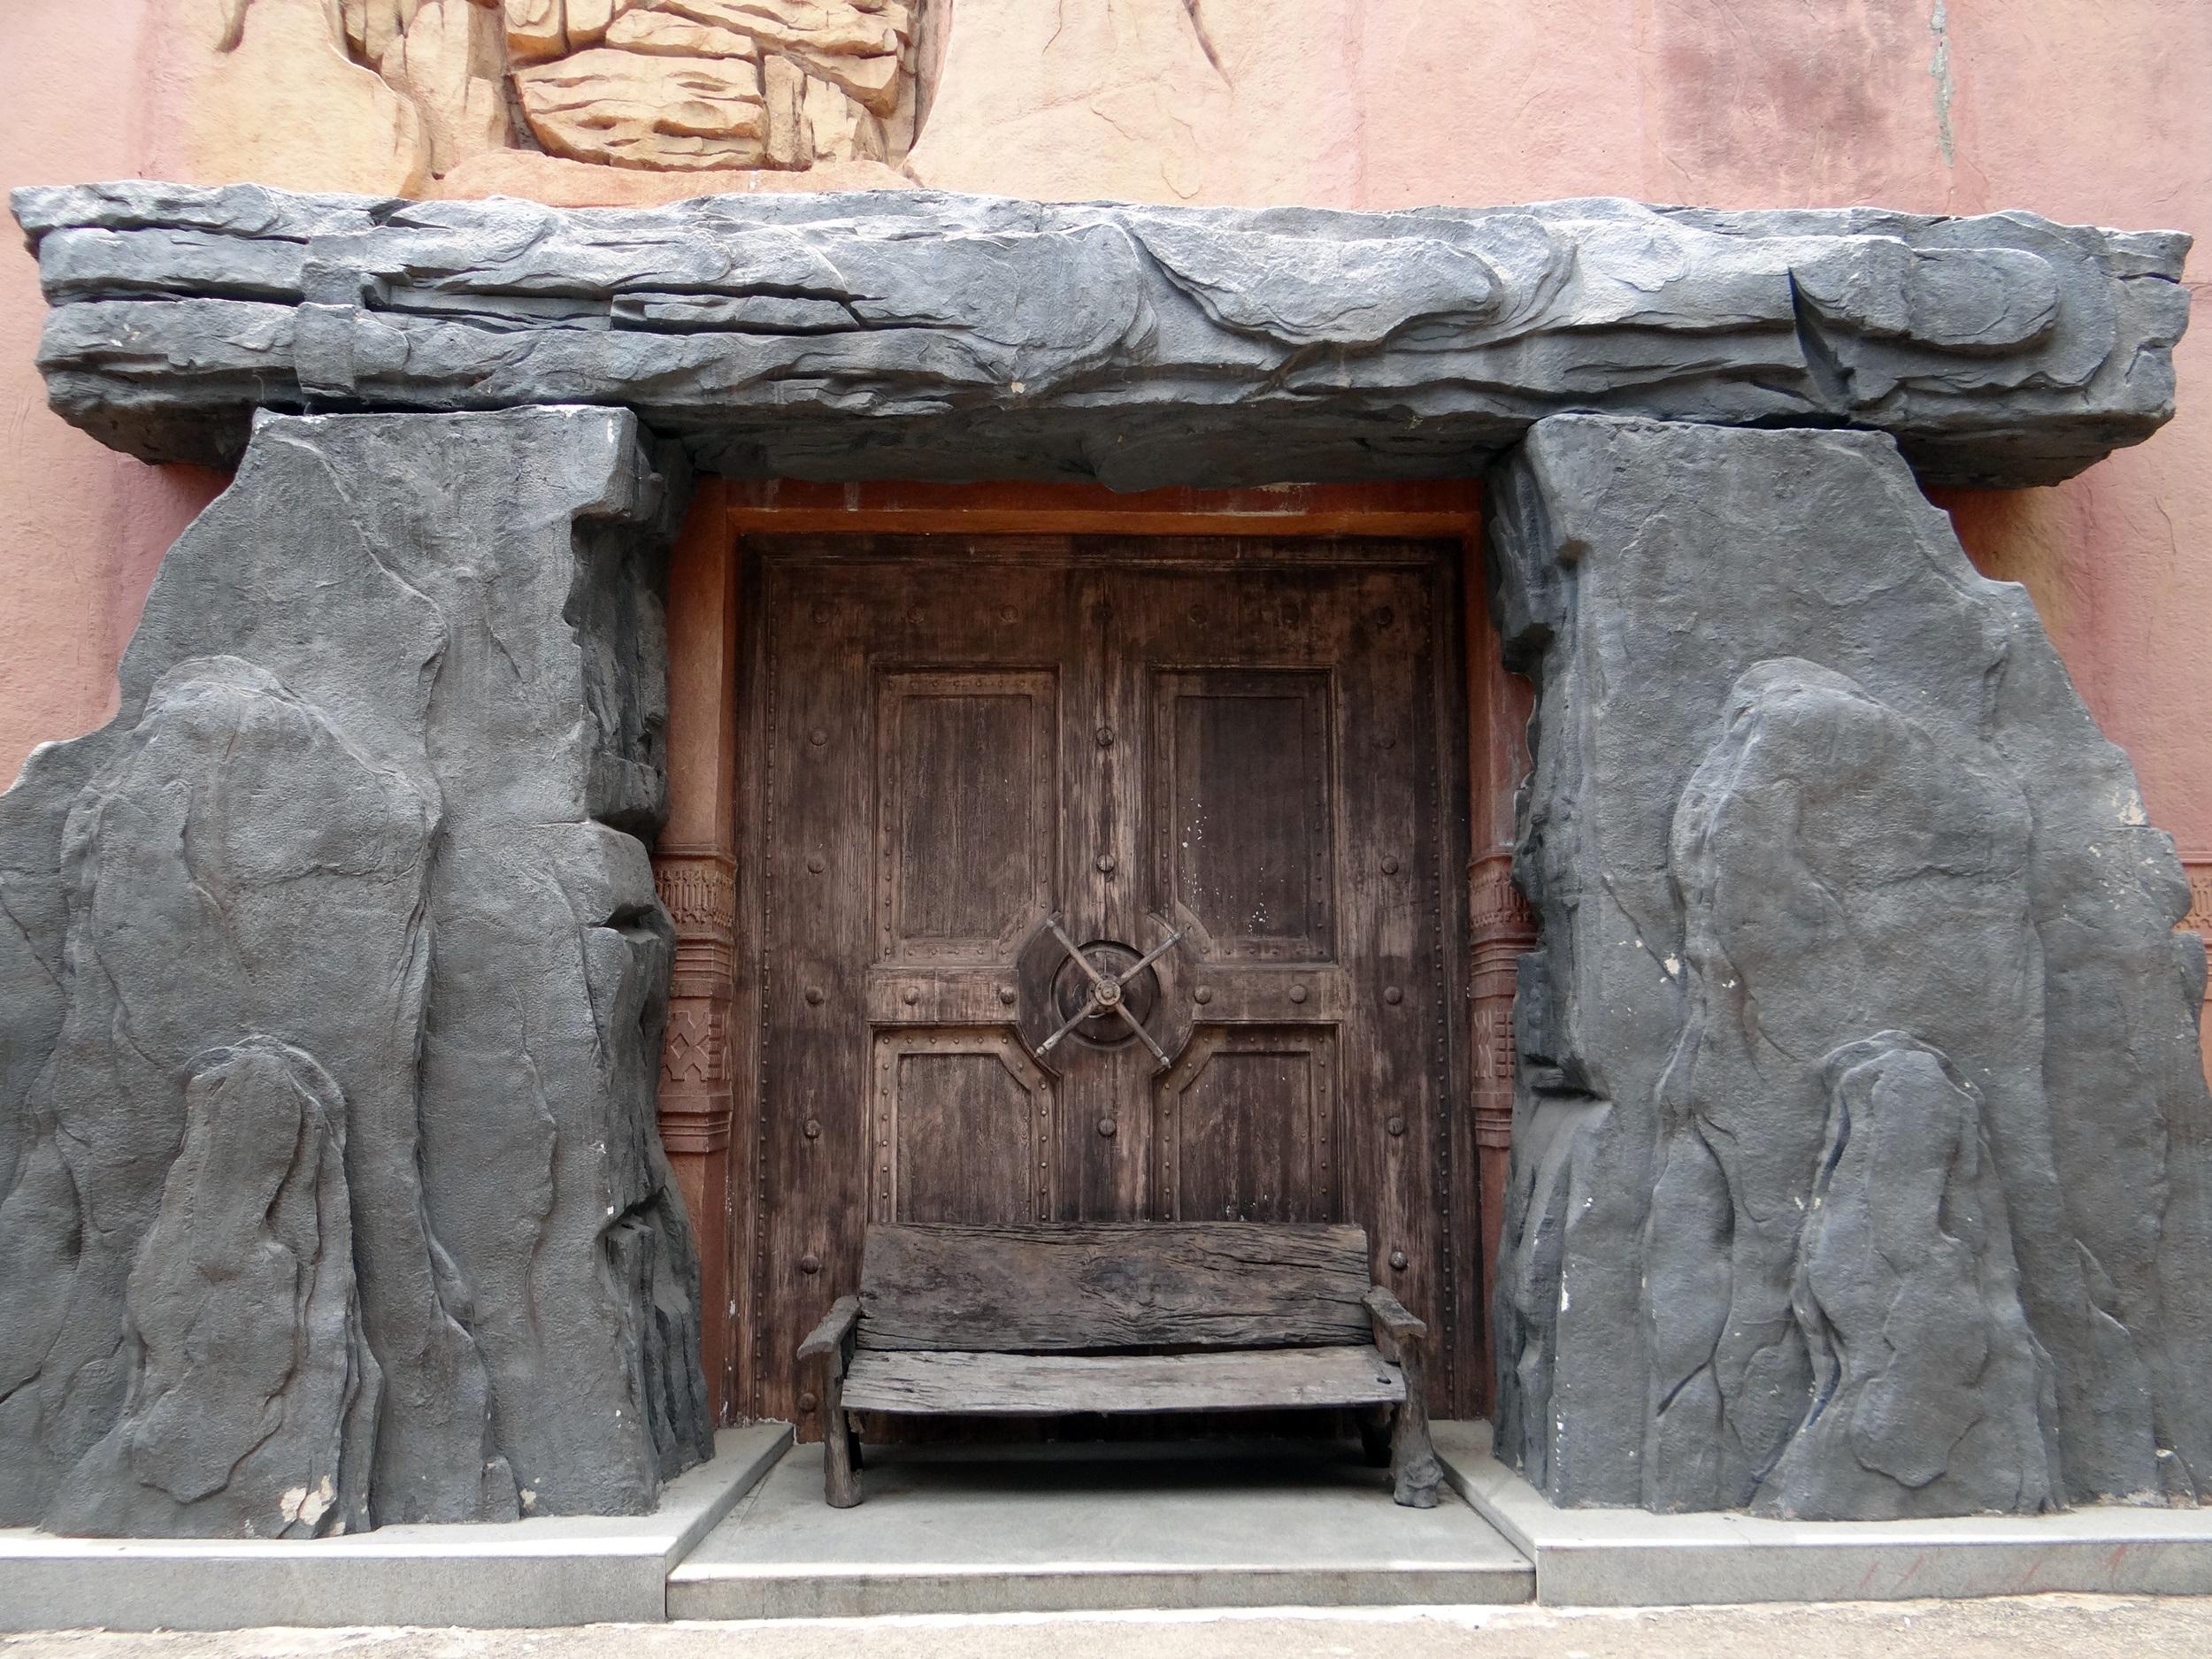 4a8602af07 Free Images : architecture, structure, wood, vintage, antique, window, old,  monument, statue, column, entrance, fireplace, furniture, door, sculpture,  ...